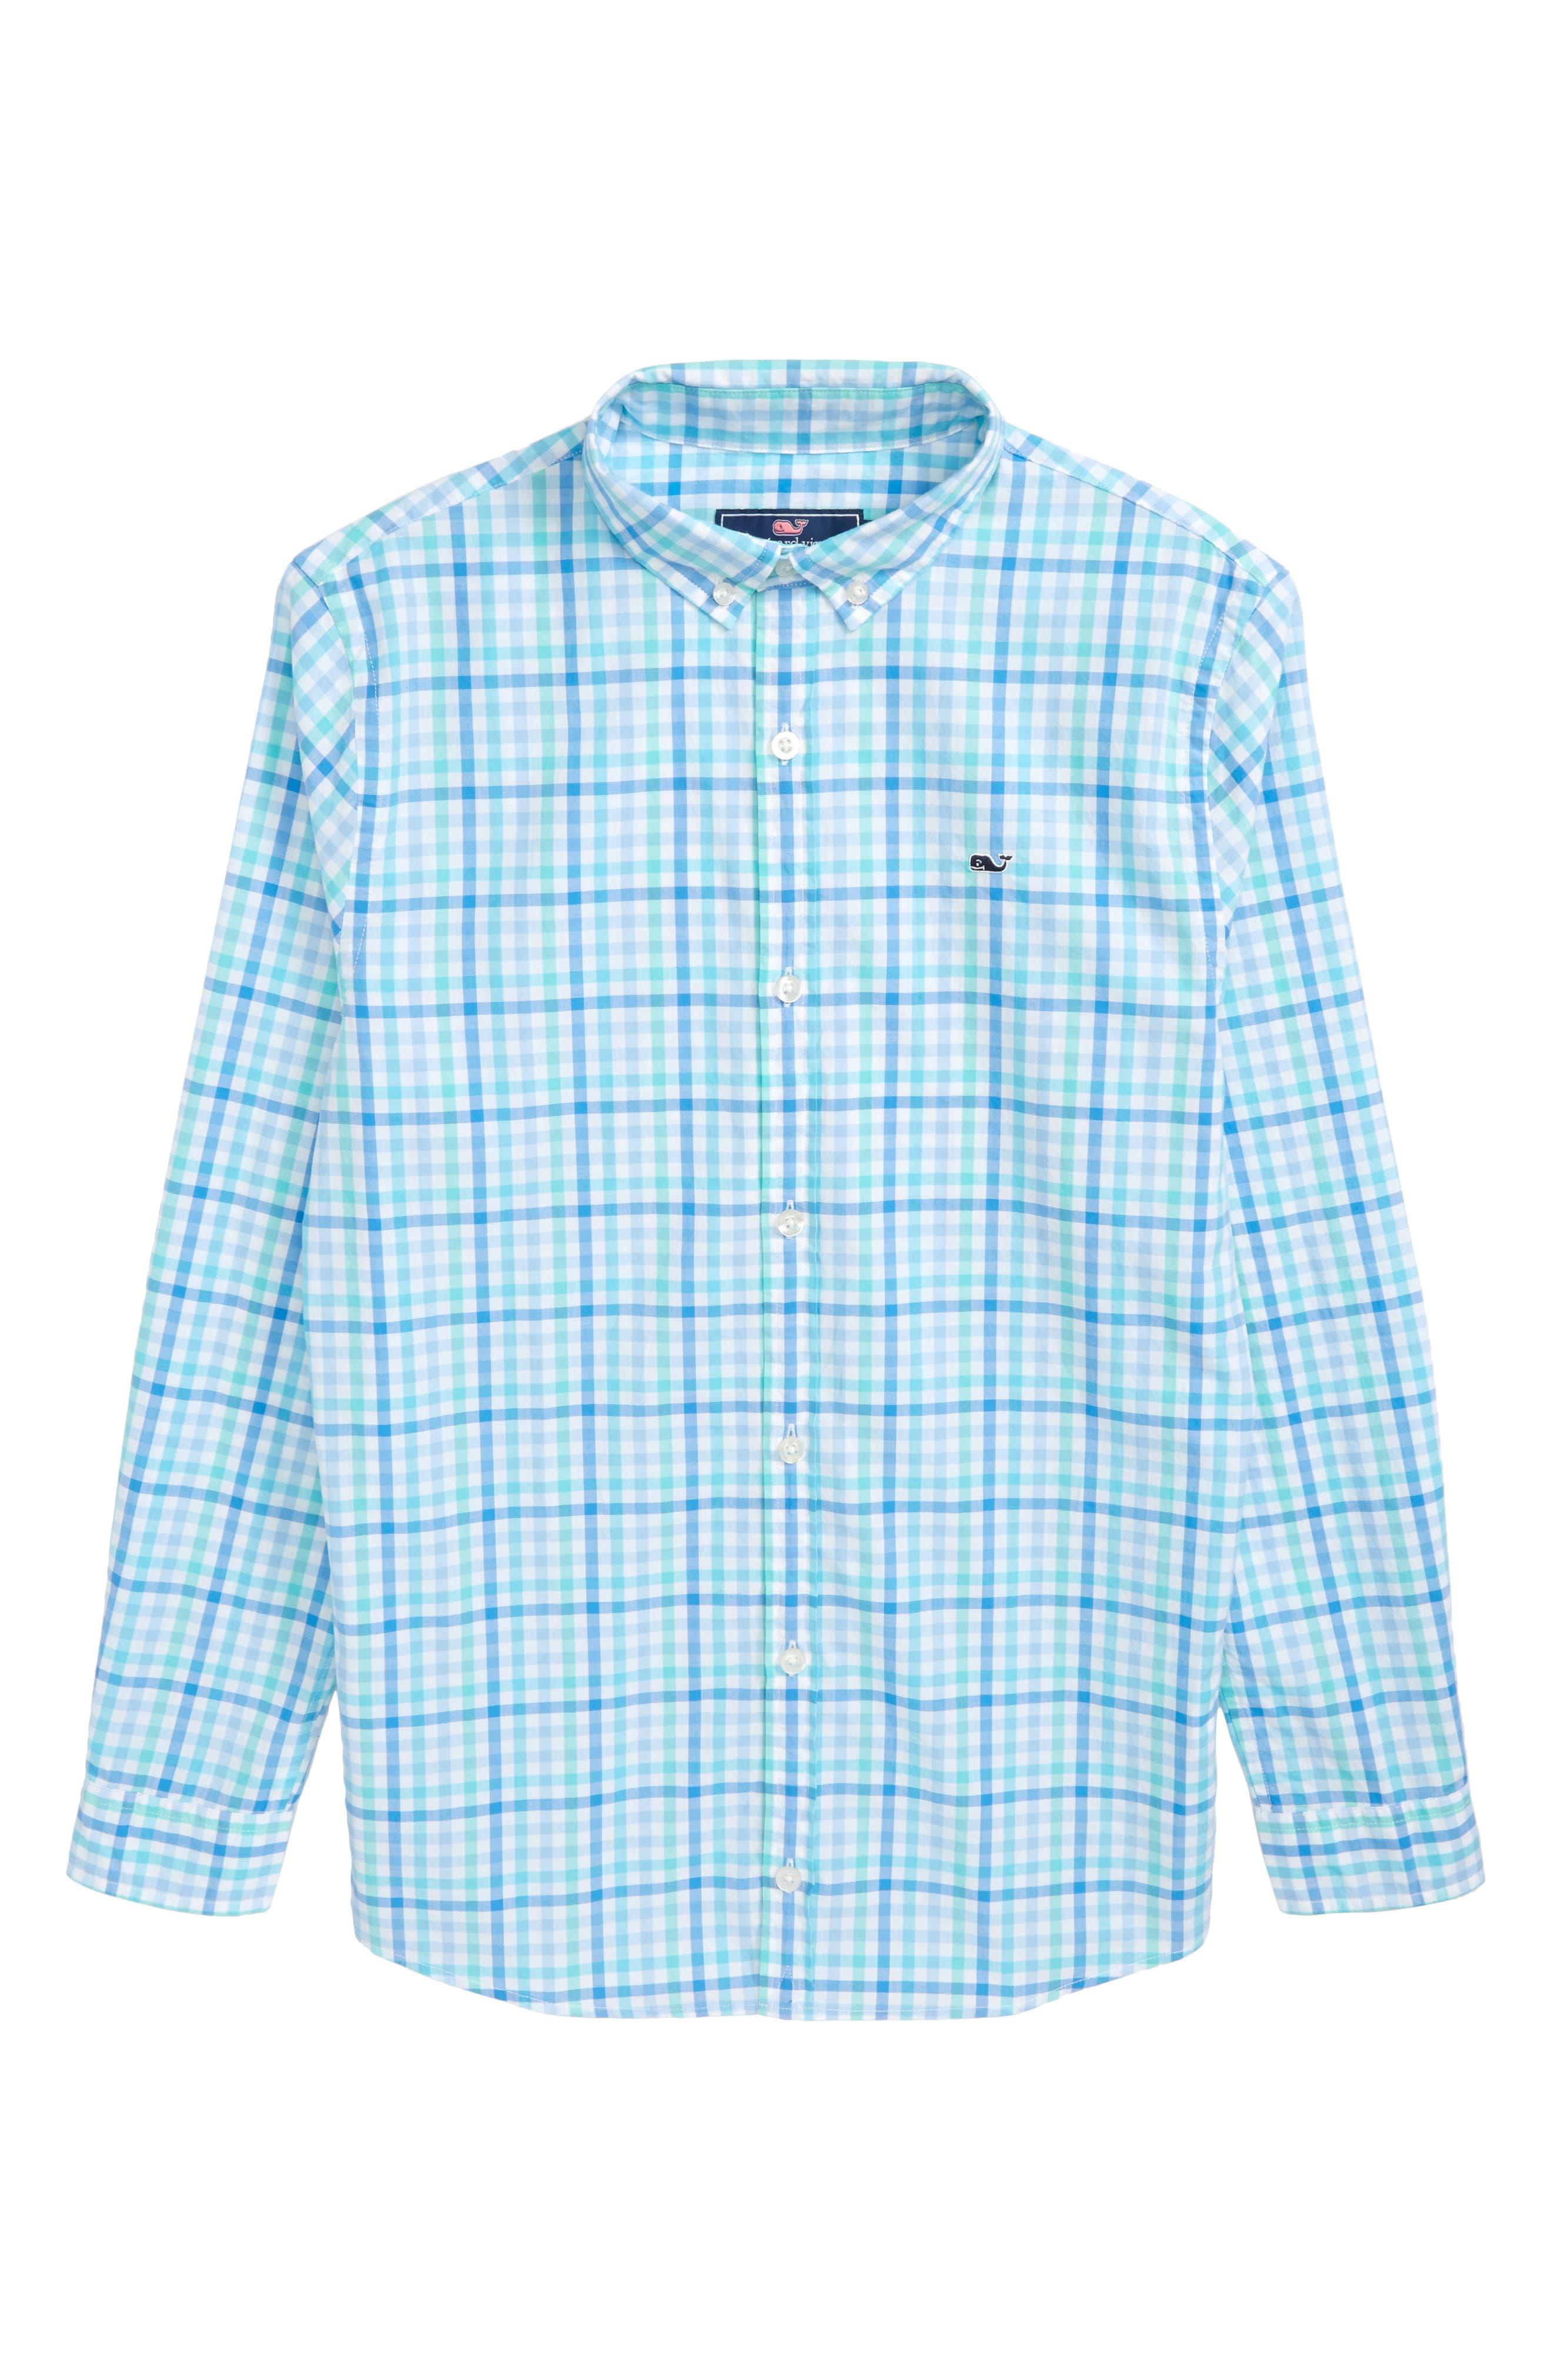 Guana Cay Gingham Check Woven Shirt,                         Main,                         color, Capri Blue